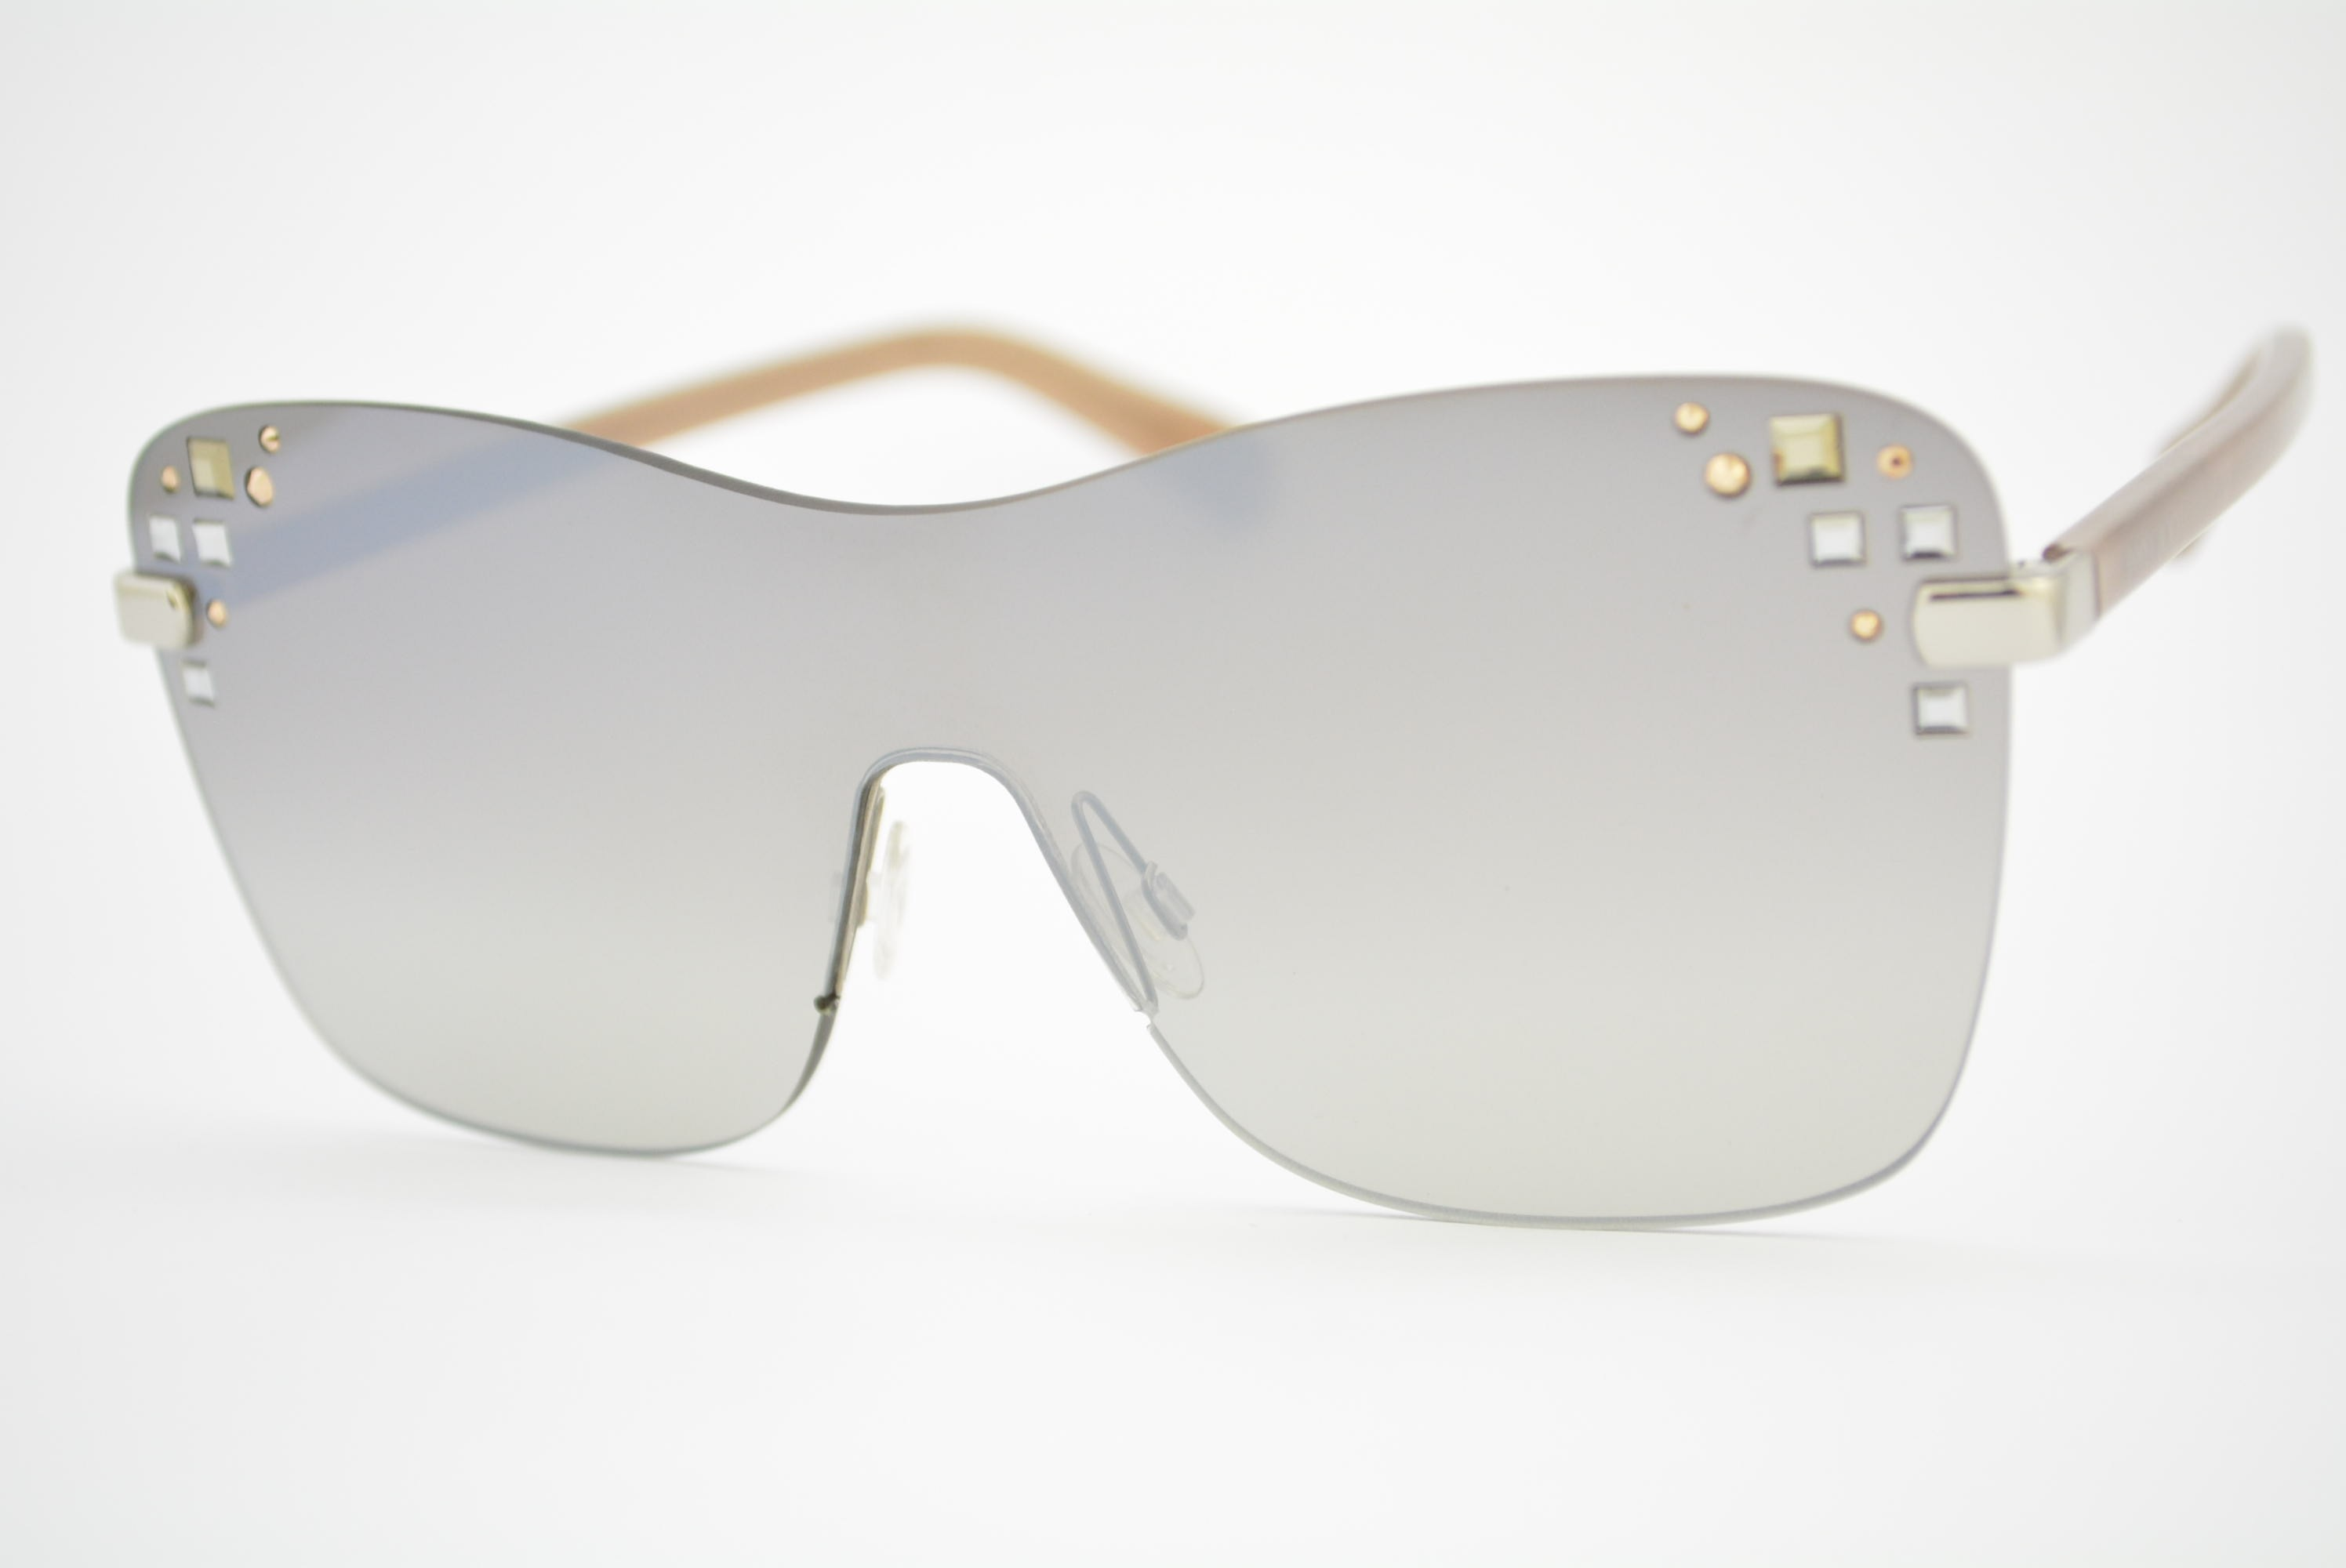 efd29f61f óculos de sol Jimmy Choo mod mask/s 137nq Ótica Cardoso